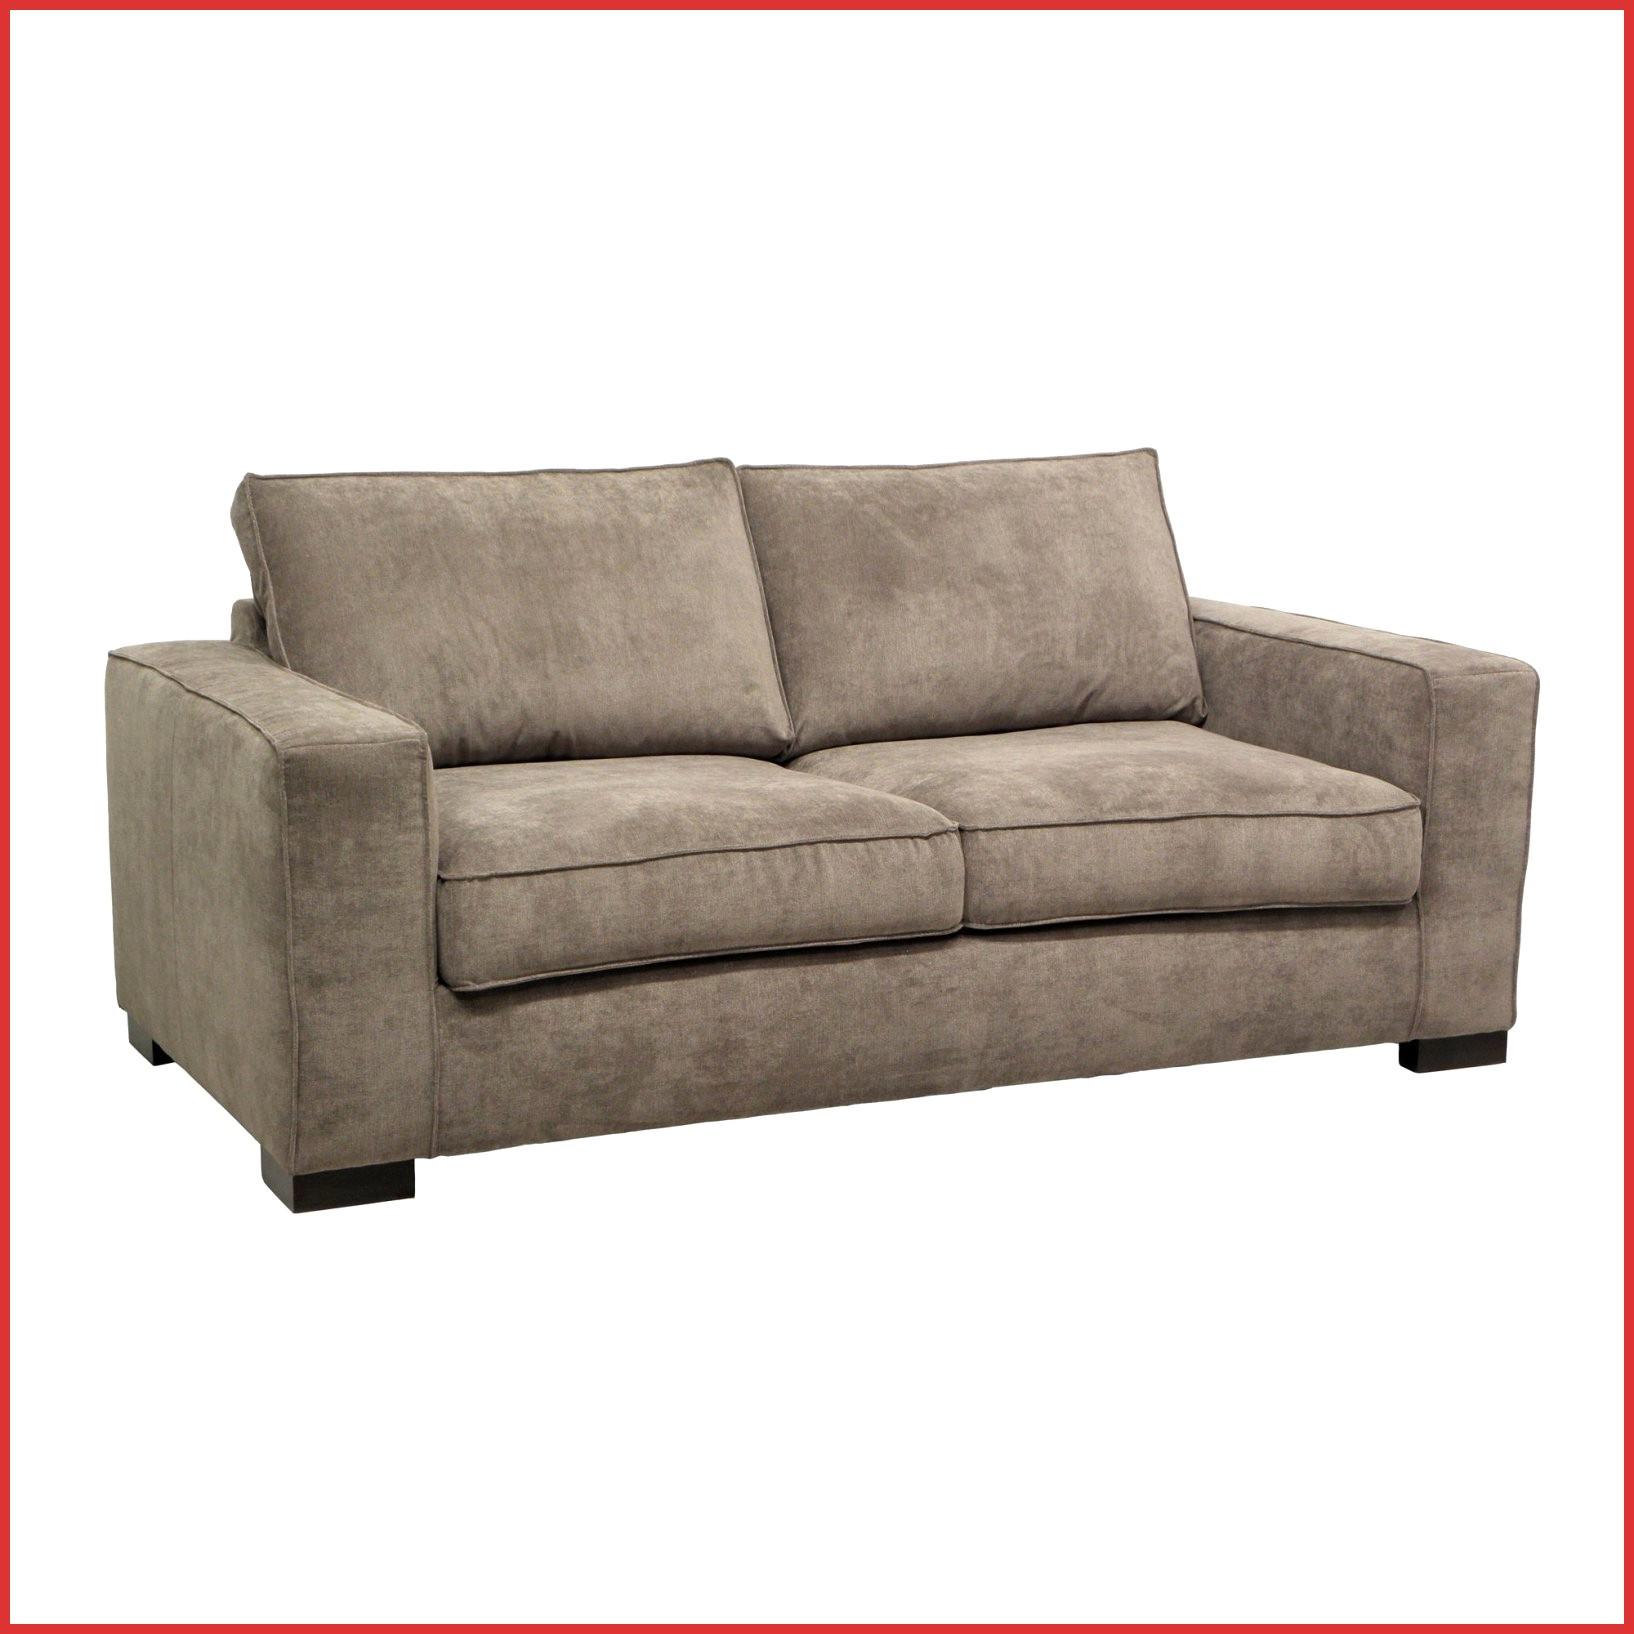 Canapé Convertible Pas Cher but Beau Stock Canap Convertible 3 Places Conforama 11 Lit 2 Pas Cher Ikea but